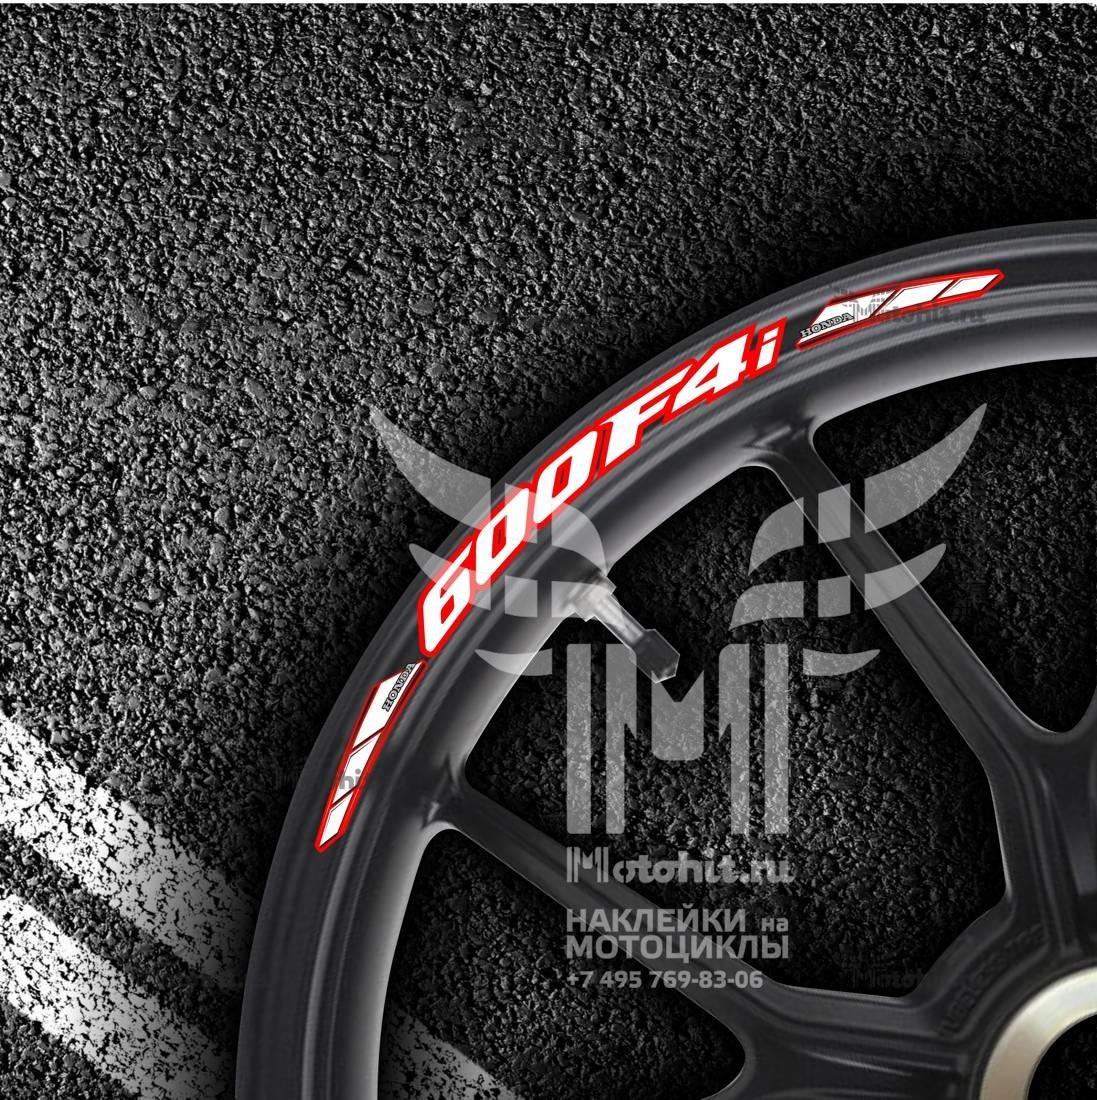 Комплект наклеек на обод колеса мотоцикла HONDA 600-F4i